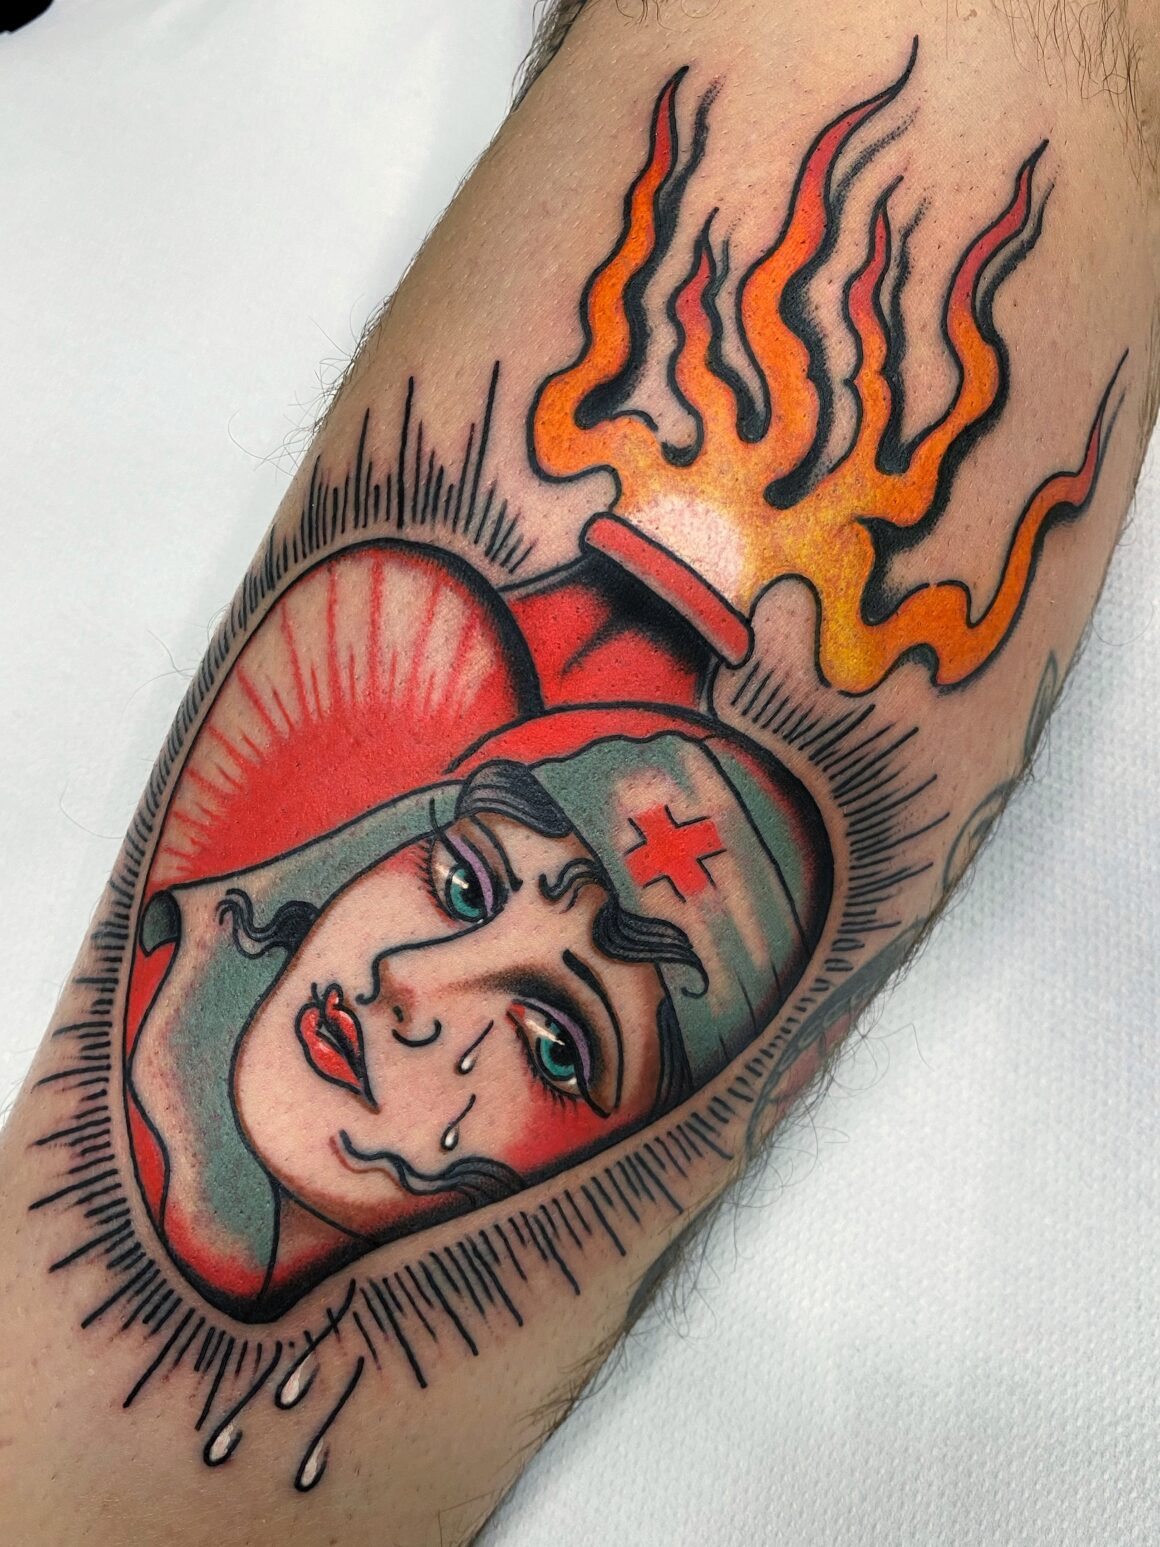 Gianluca Artico, Macko Tattoo Shop, Roma